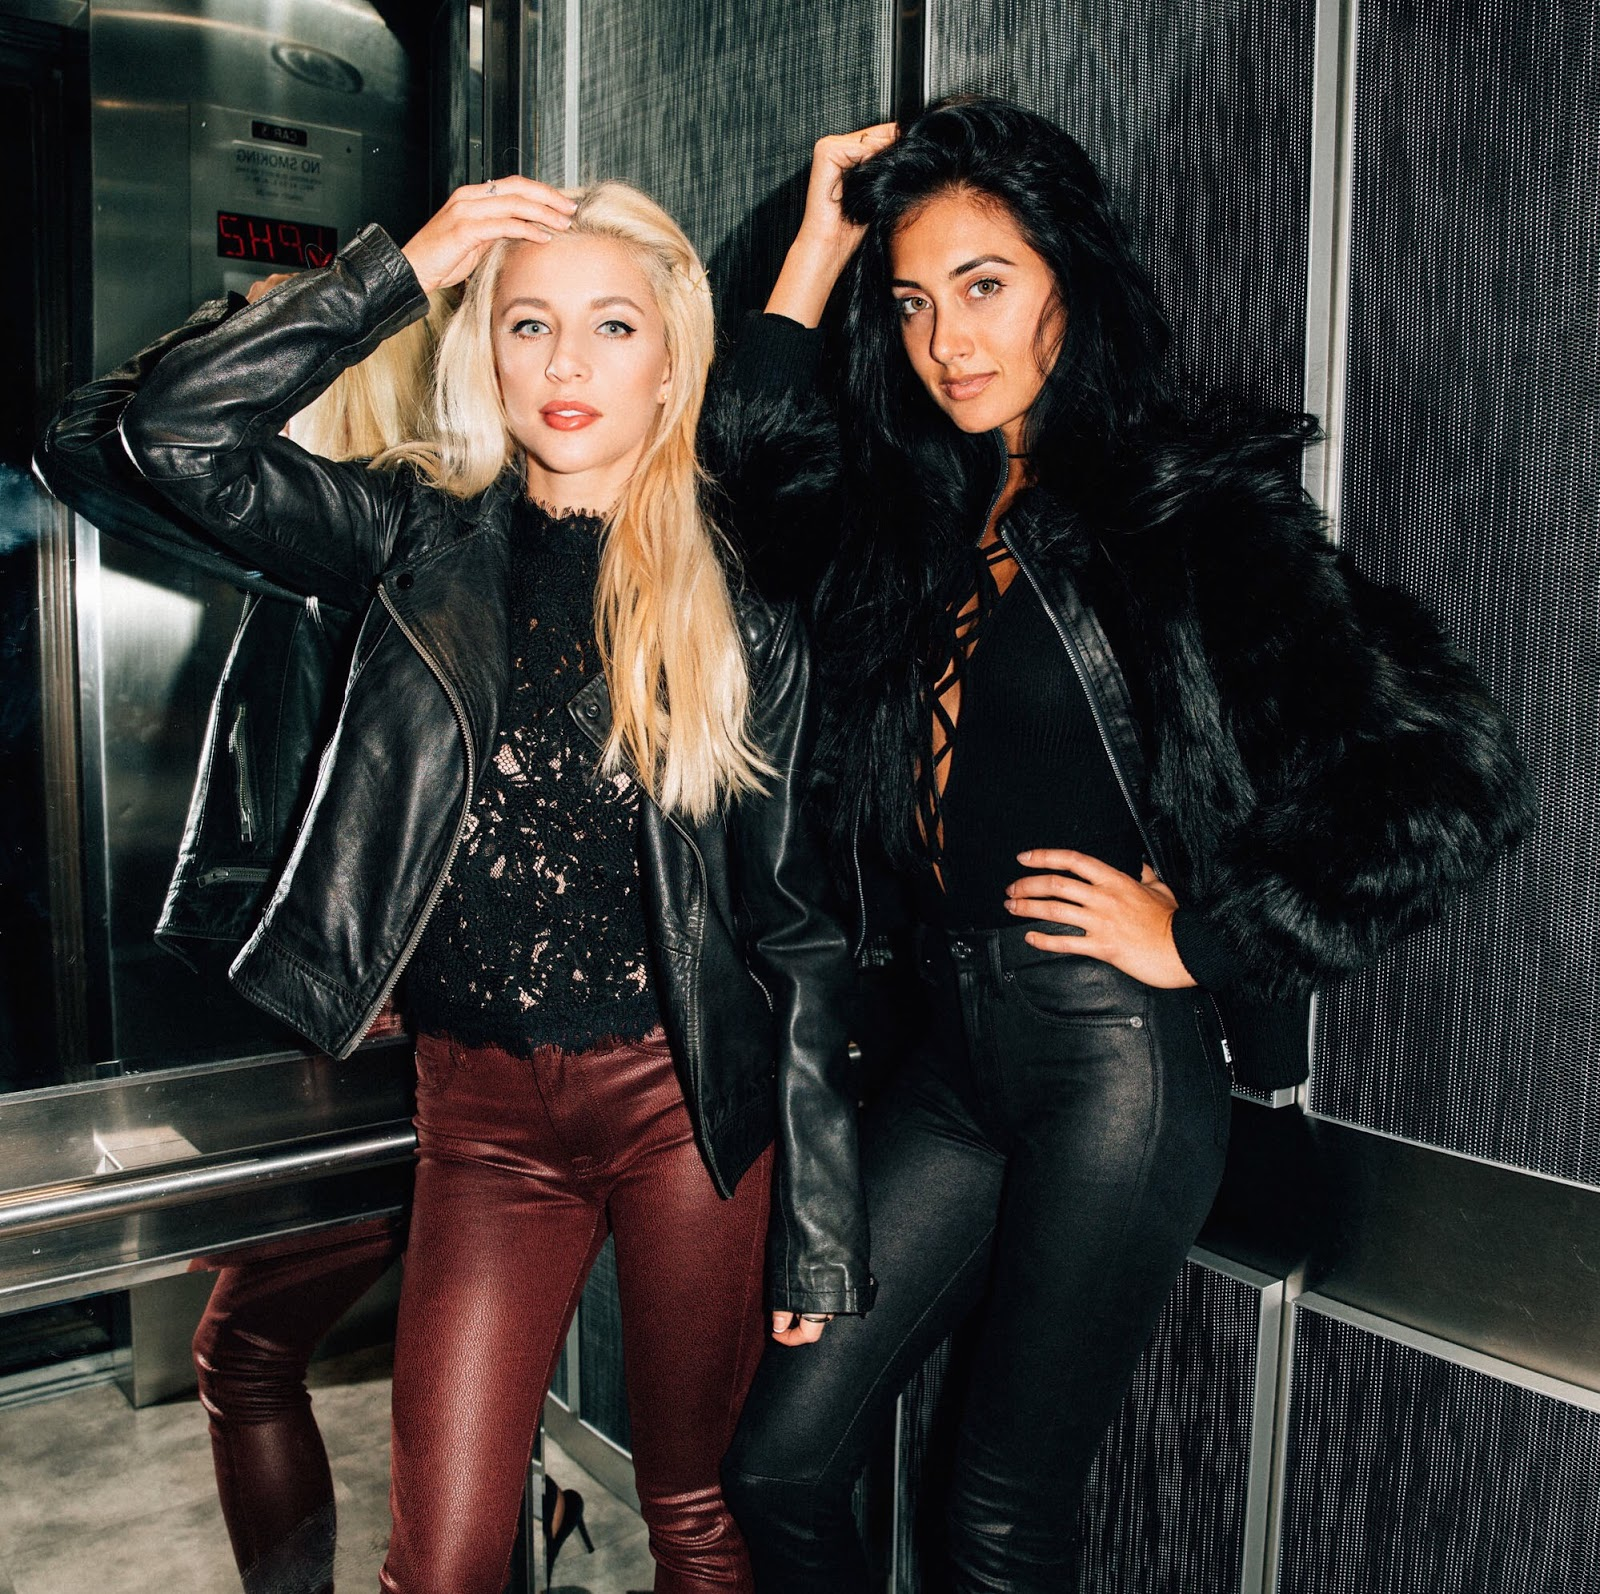 e16a658da365 Girls night out with 7Fam x Evelina - Racquel Natasha